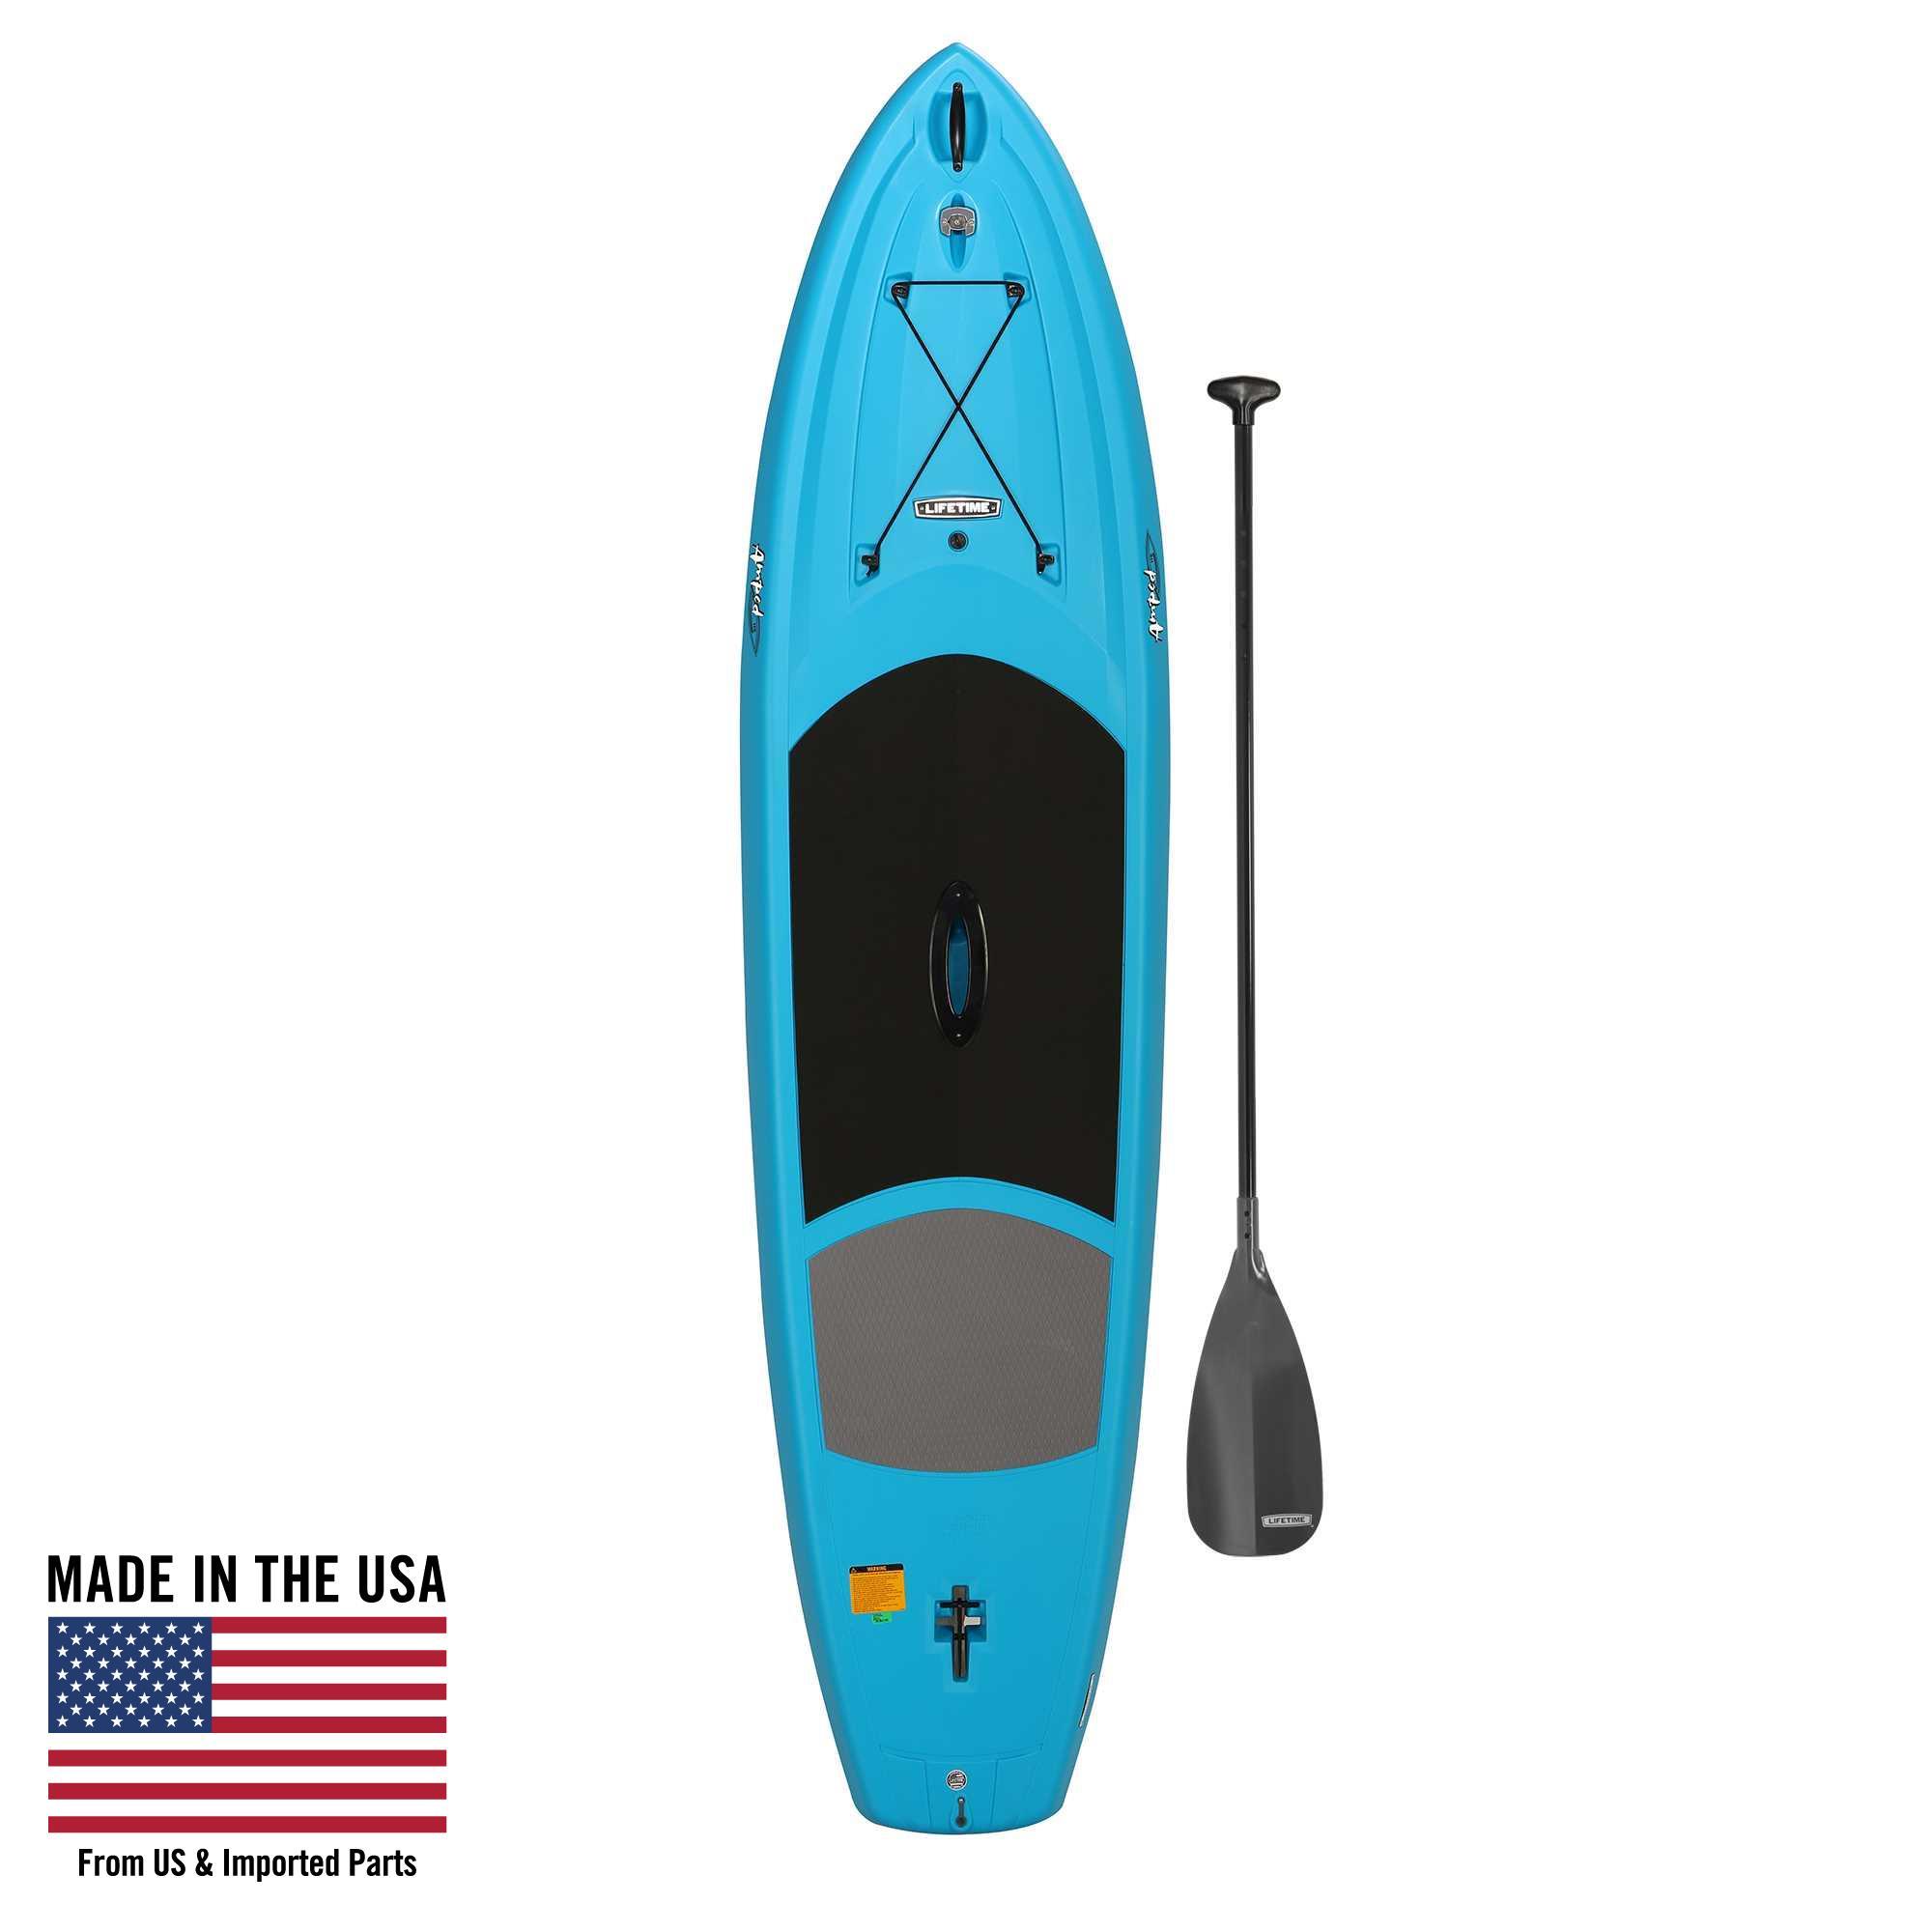 Lifetime 11' Amped Stand Up Paddleboard, Glacier Blue with Bonus Paddle